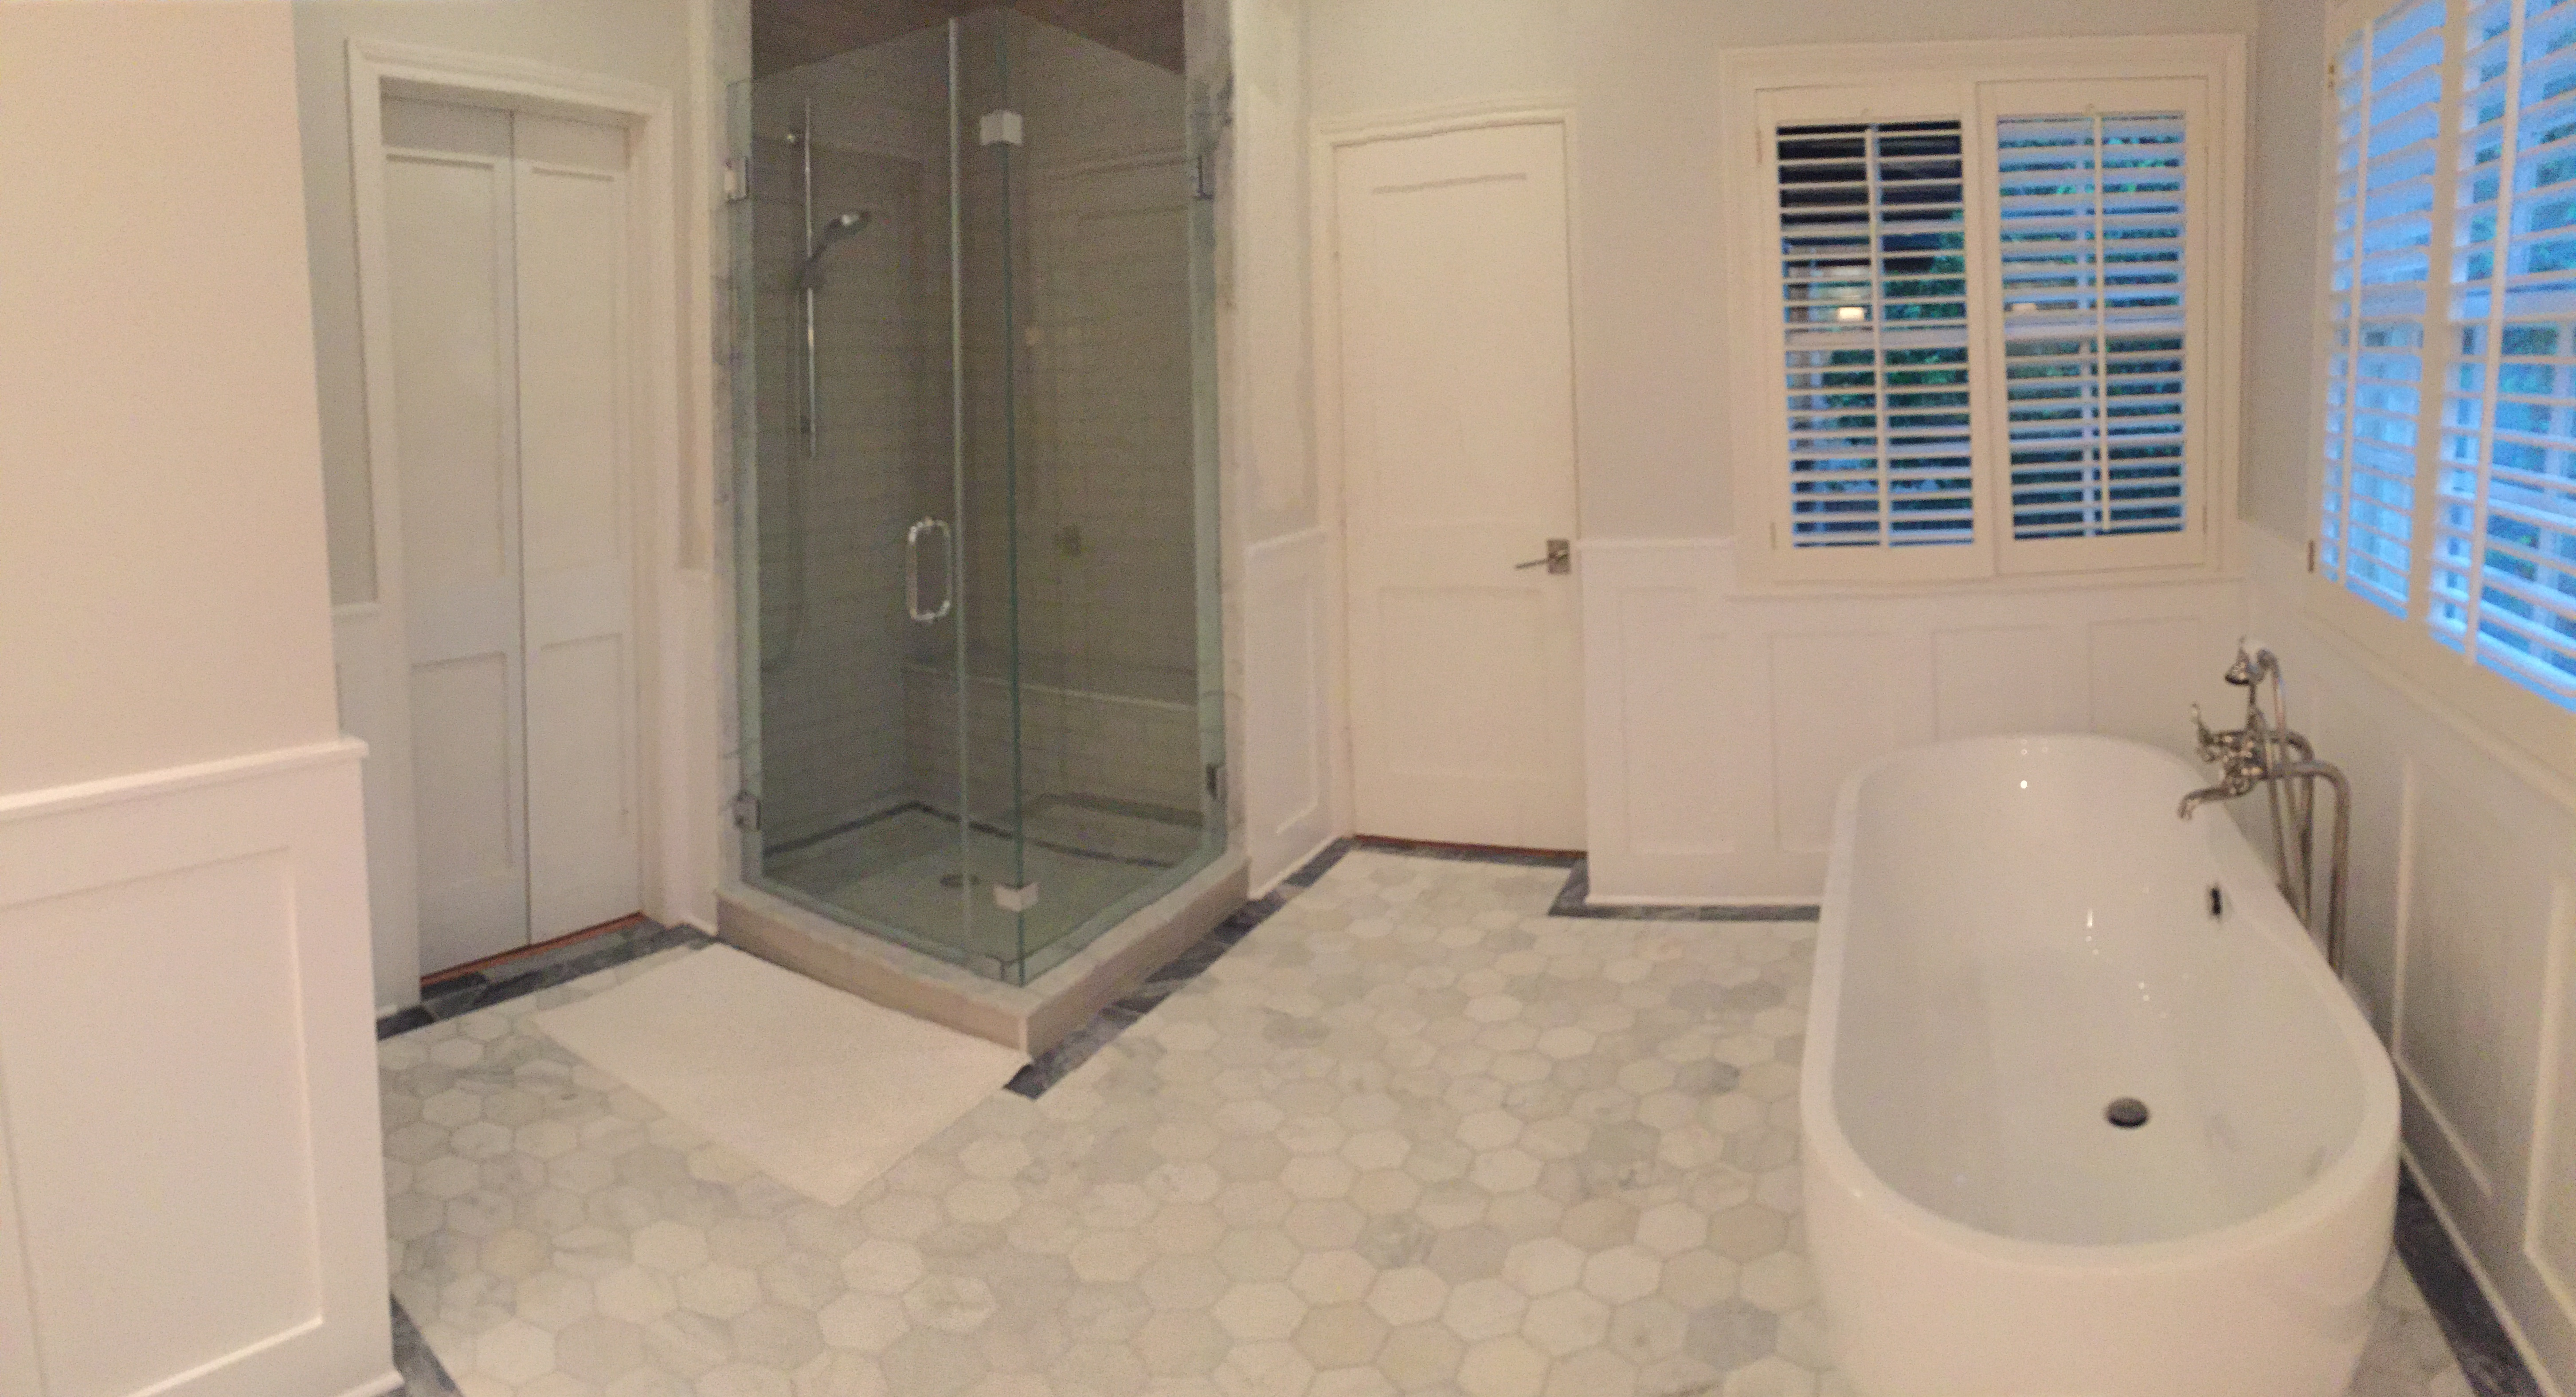 Bathroom Remodel Gallery Home Remedy Houston